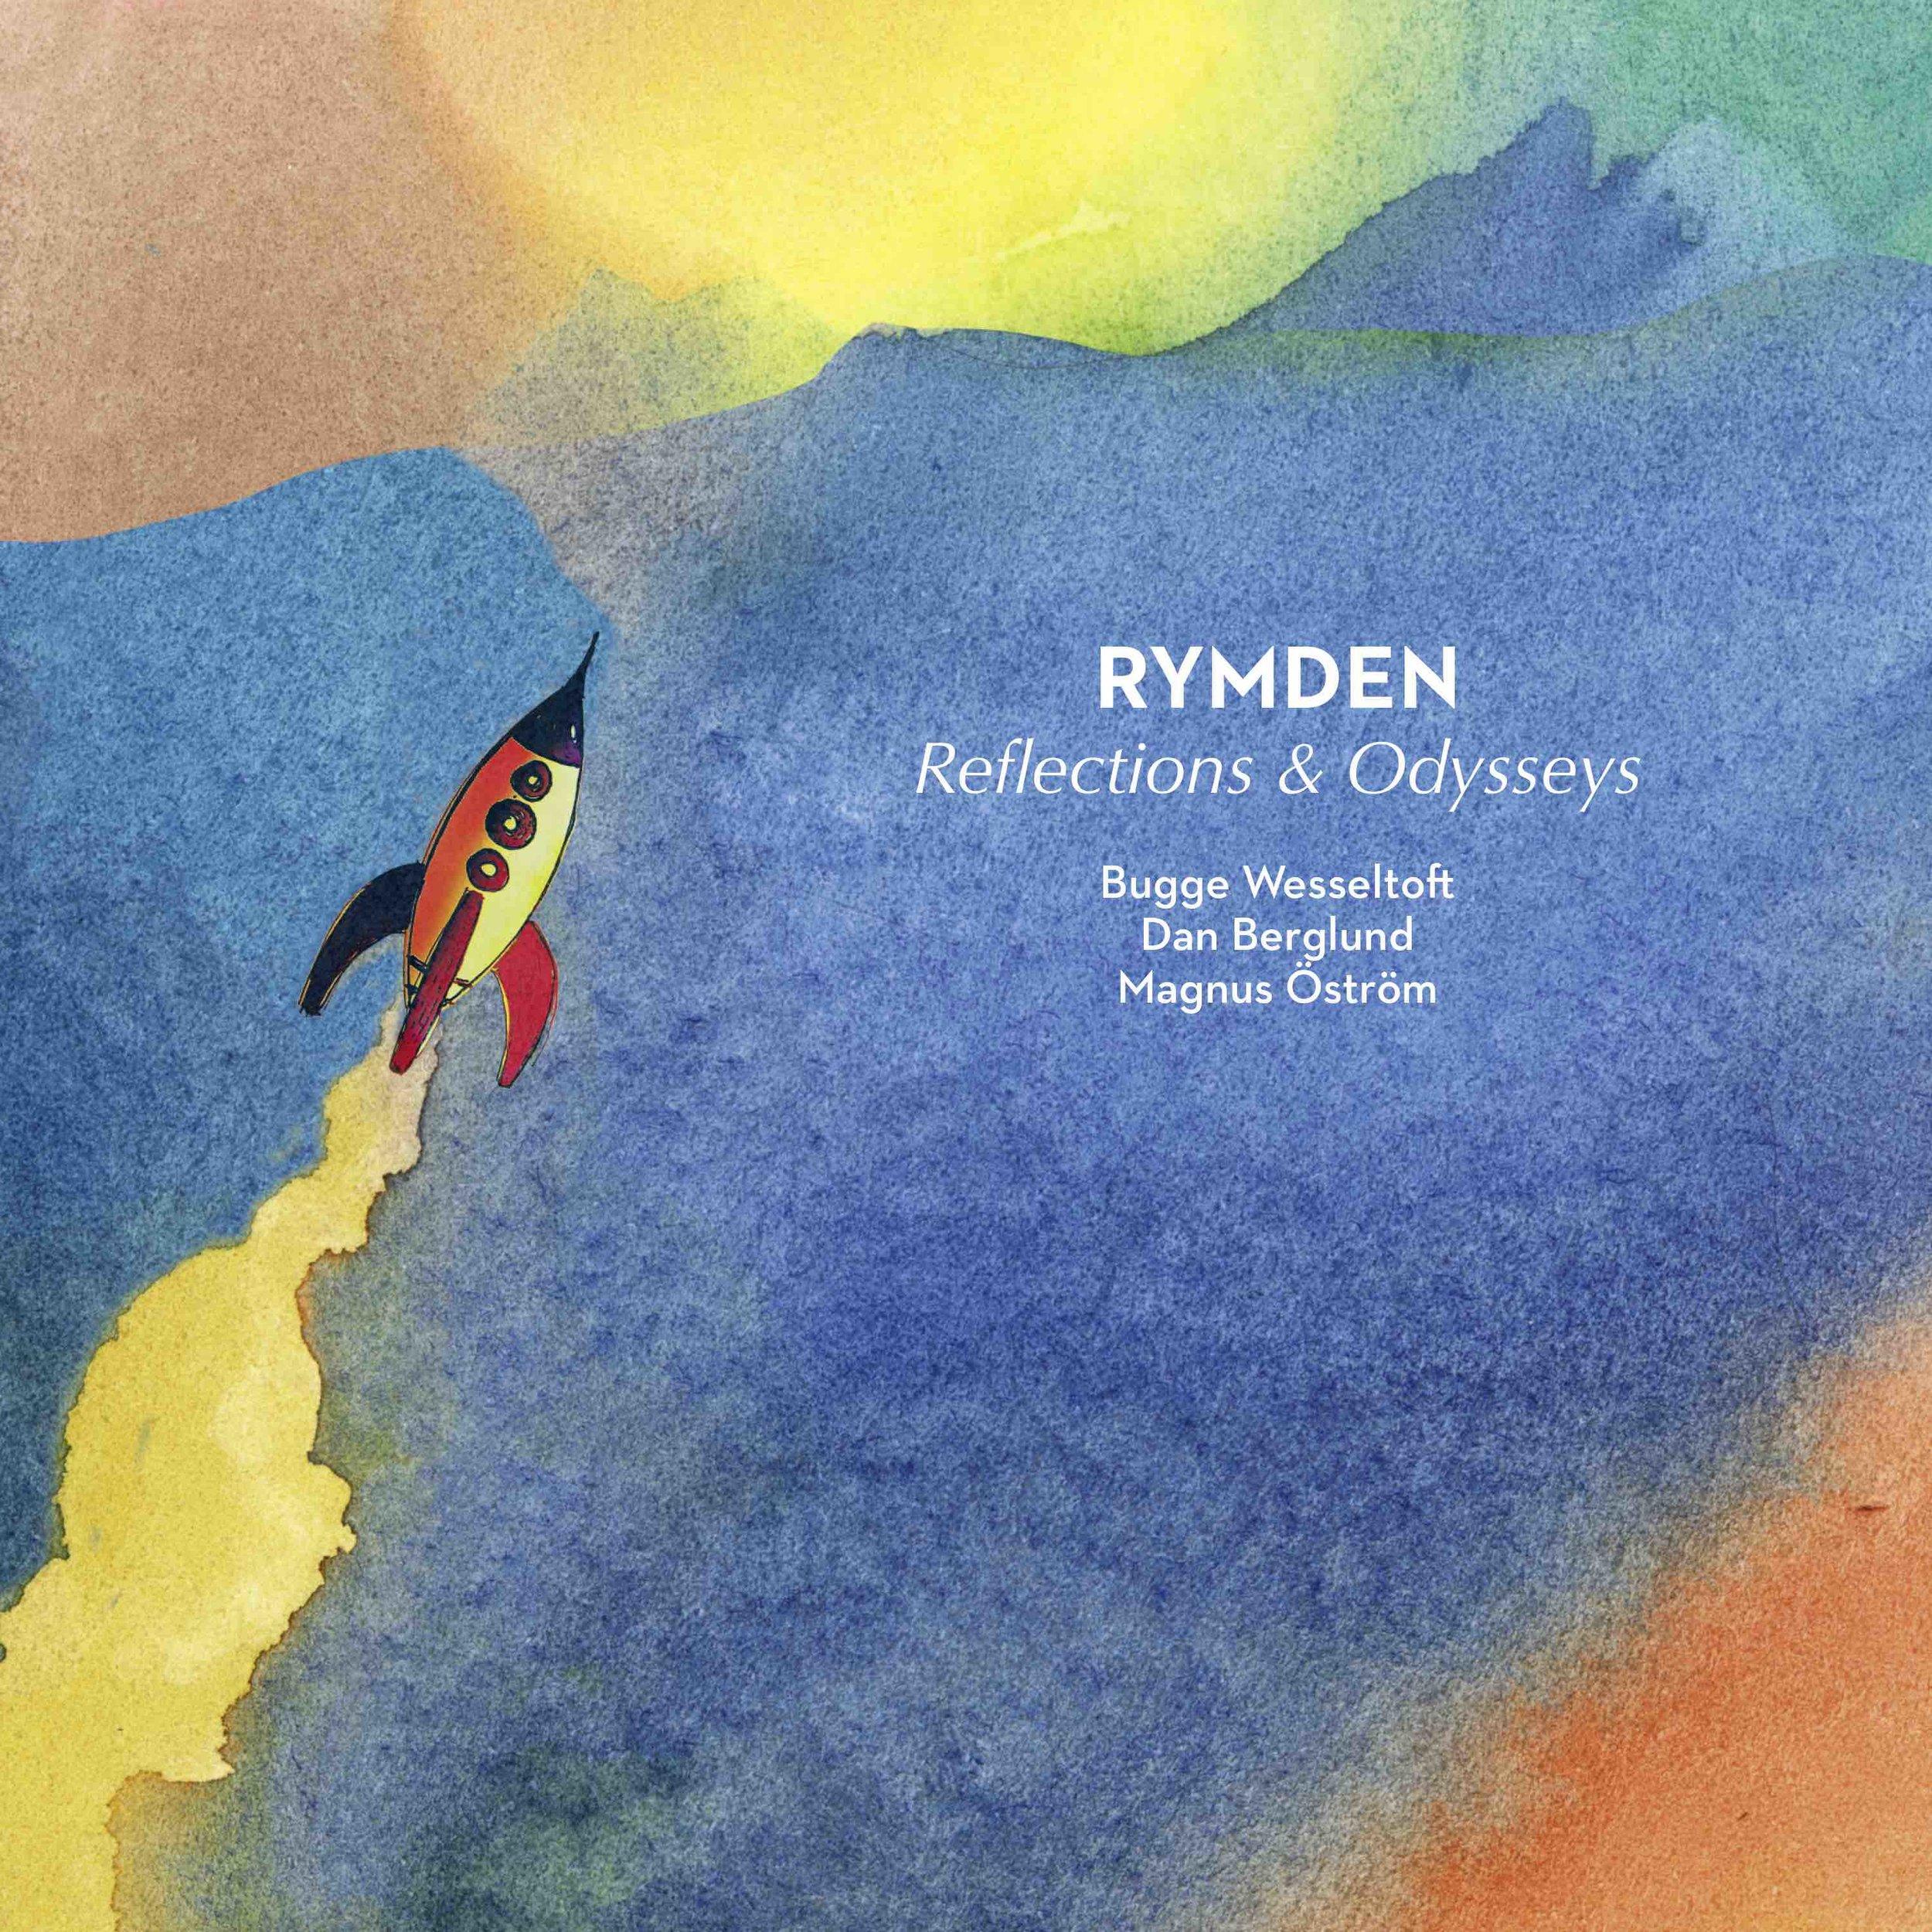 Album Refections & Odysseys